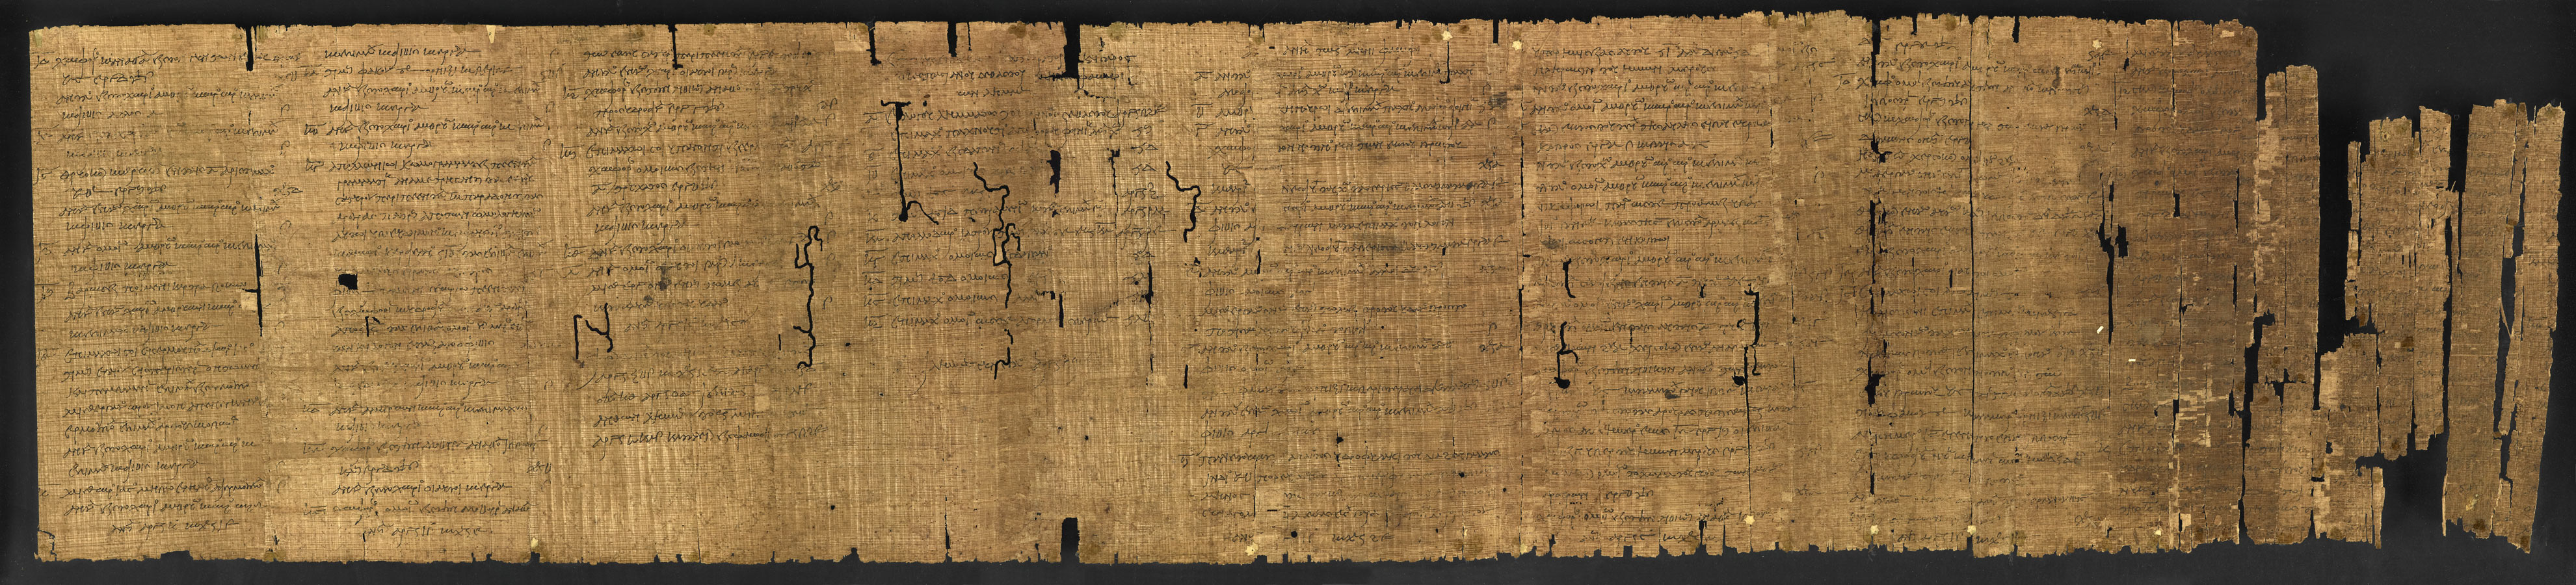 How Arabic Translators Helped Preserve Greek Philosophy